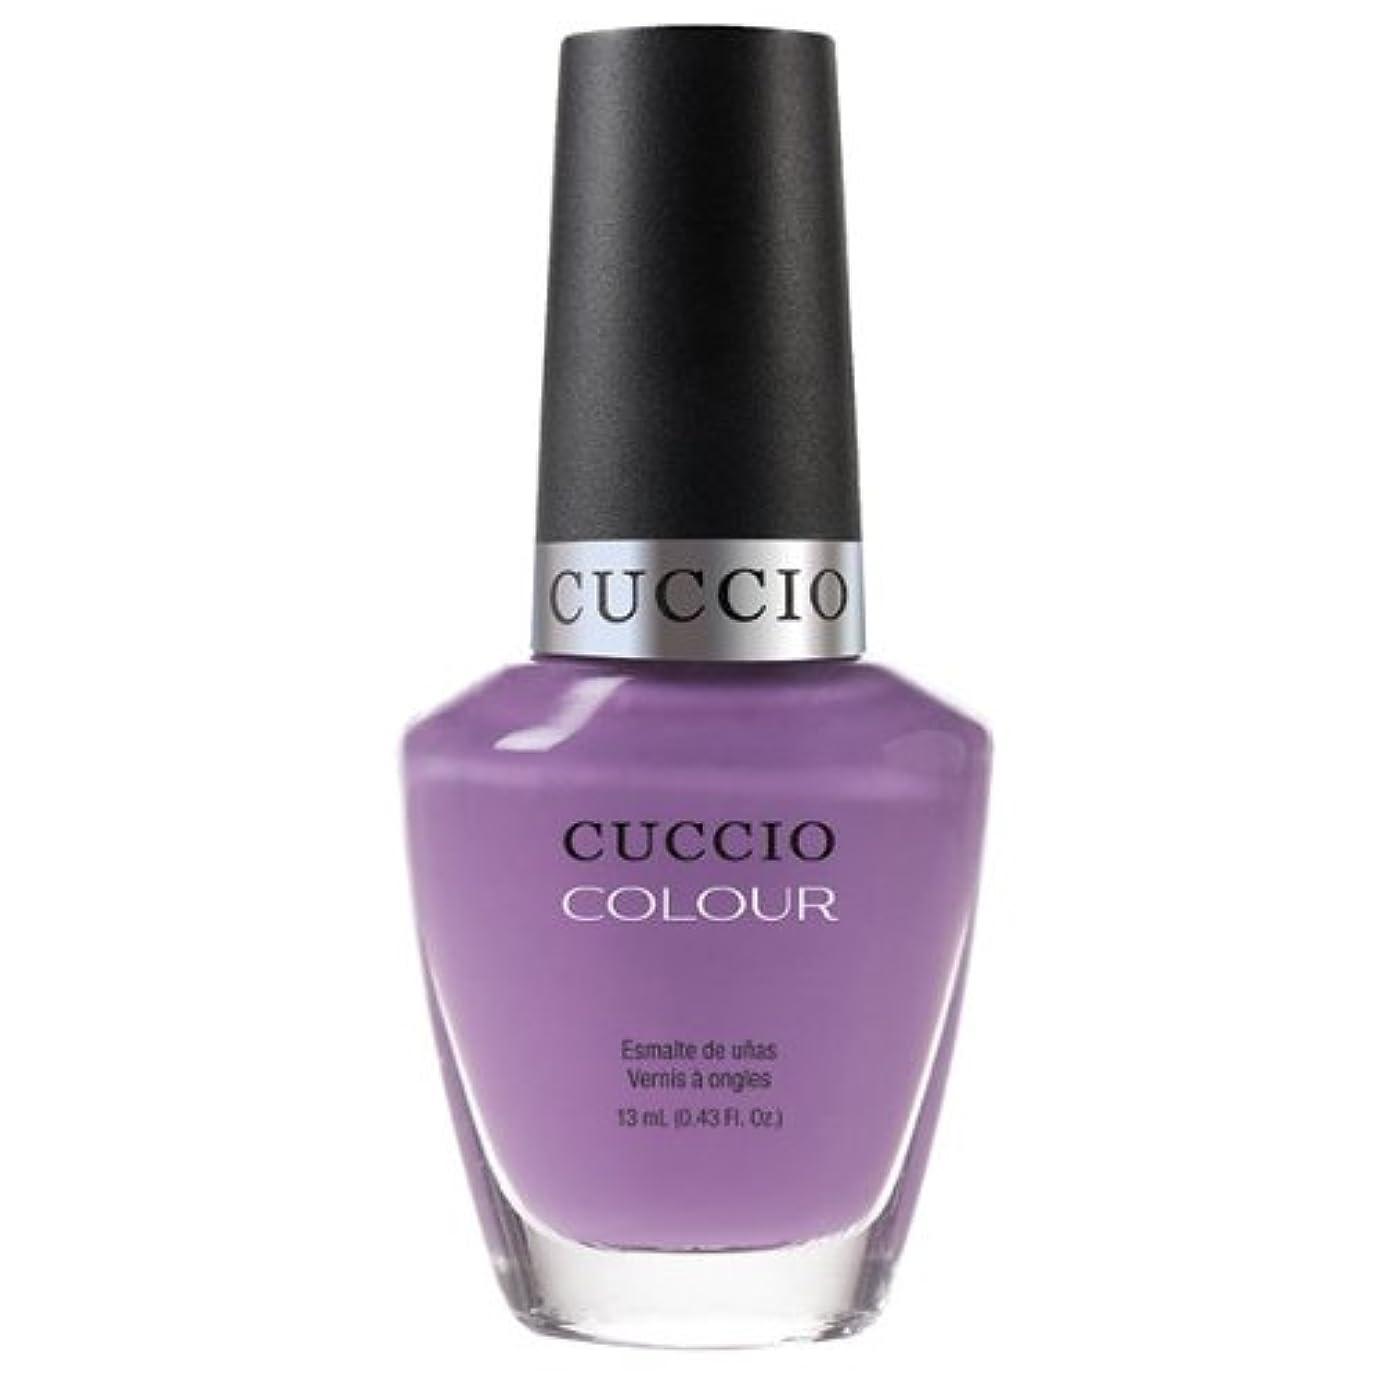 傑作比喩砲撃Cuccio Colour Gloss Lacquer - Cheeky in Helsinki - 0.43oz / 13ml